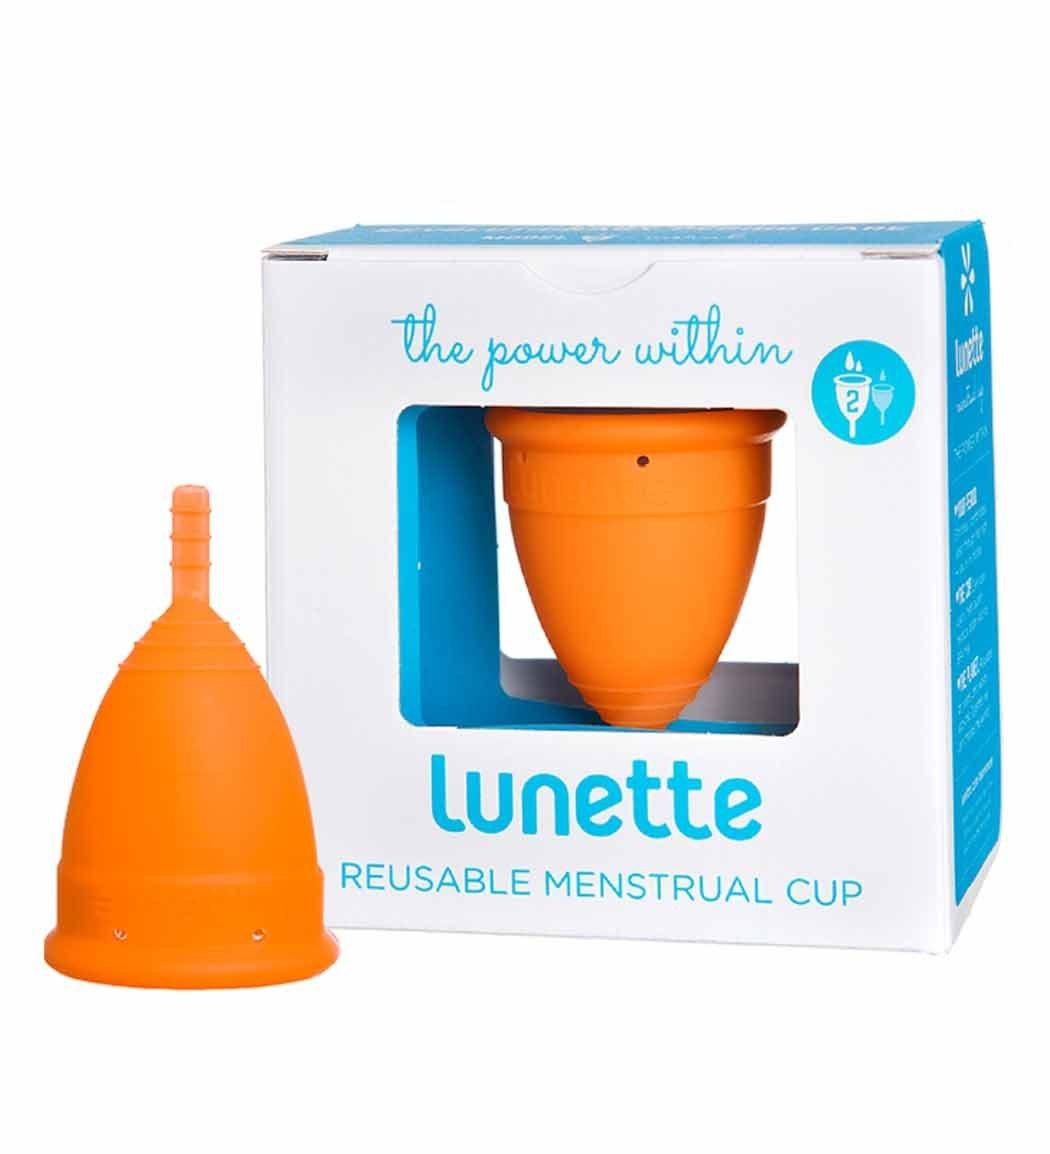 کاپ قاعدگی سایز 1لونت | Lunette Size 1 Menstrual Cup